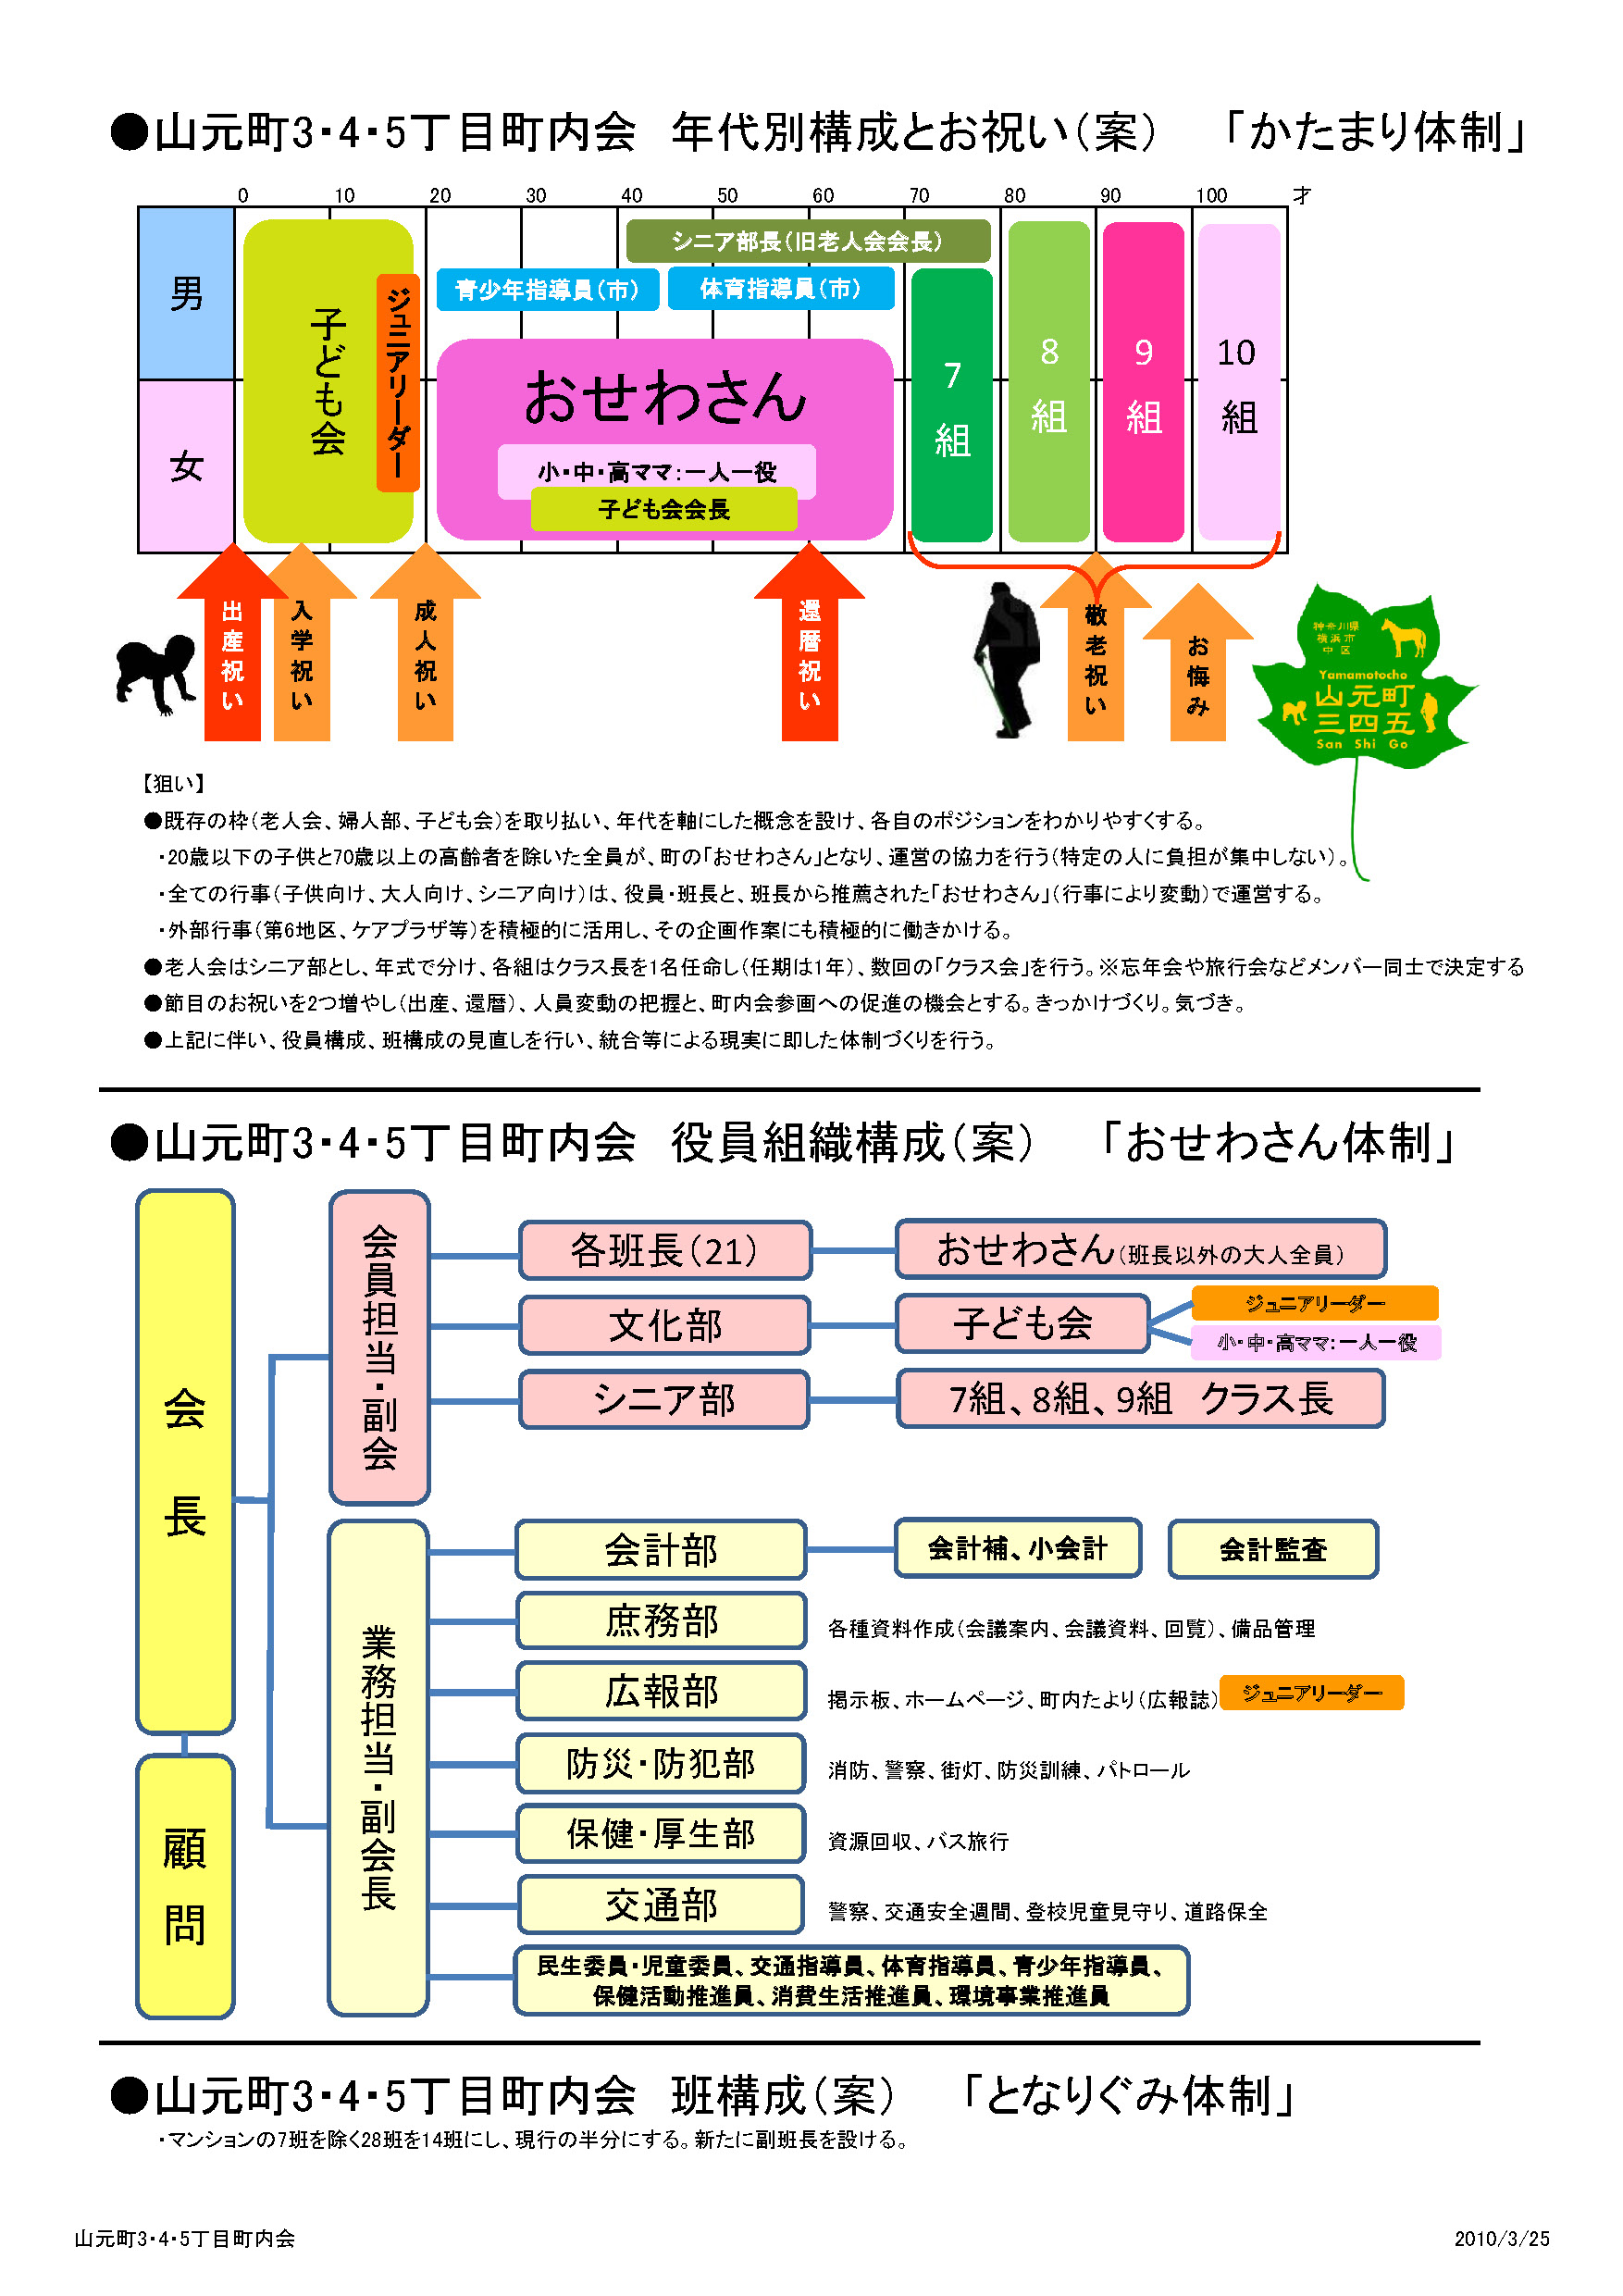 tayori_1003-2